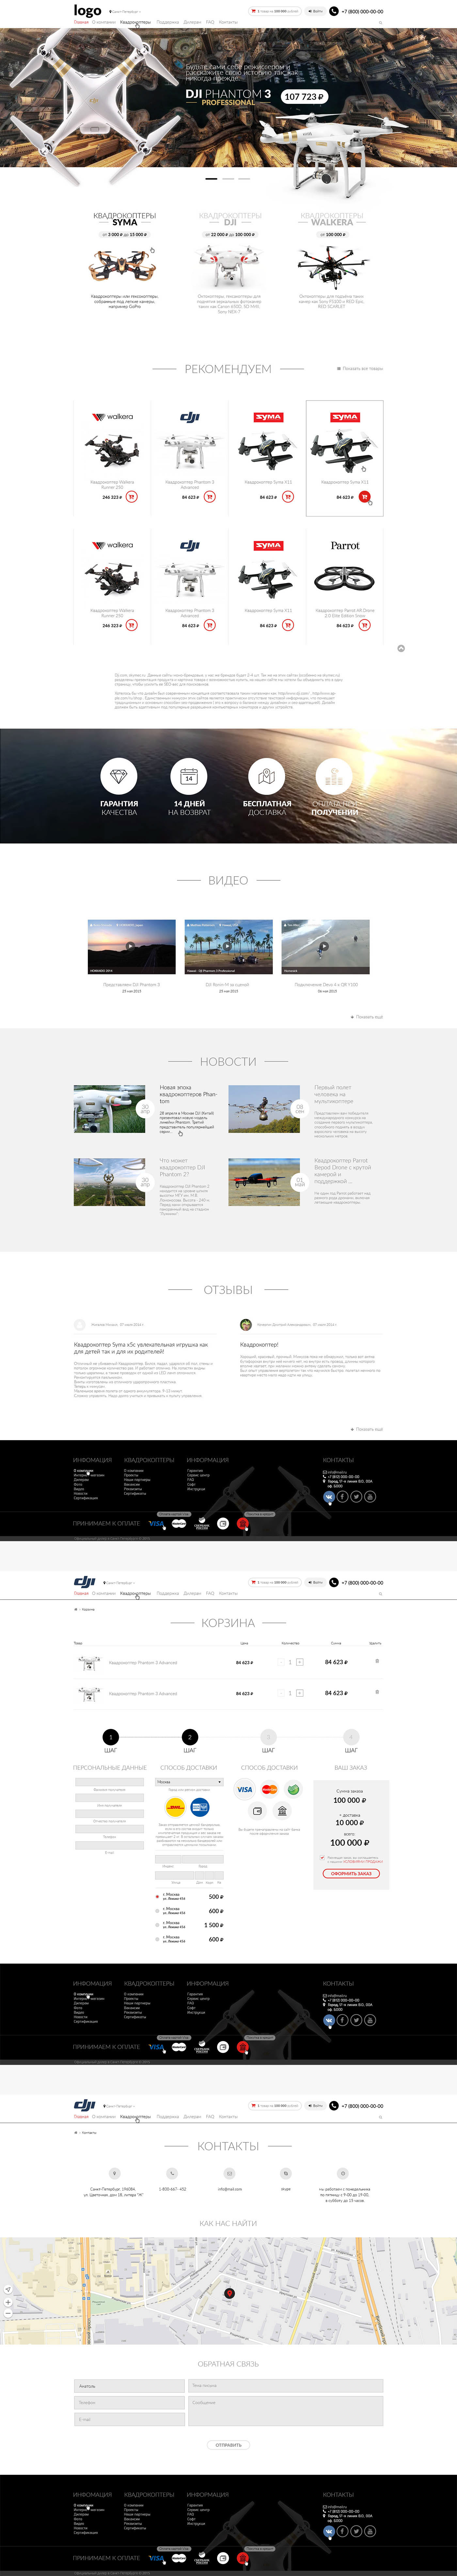 квадрокоптеры DJI интернет-магазин дизайн сайта Website Design Webdesign UI/UX Сайт под ключ Website